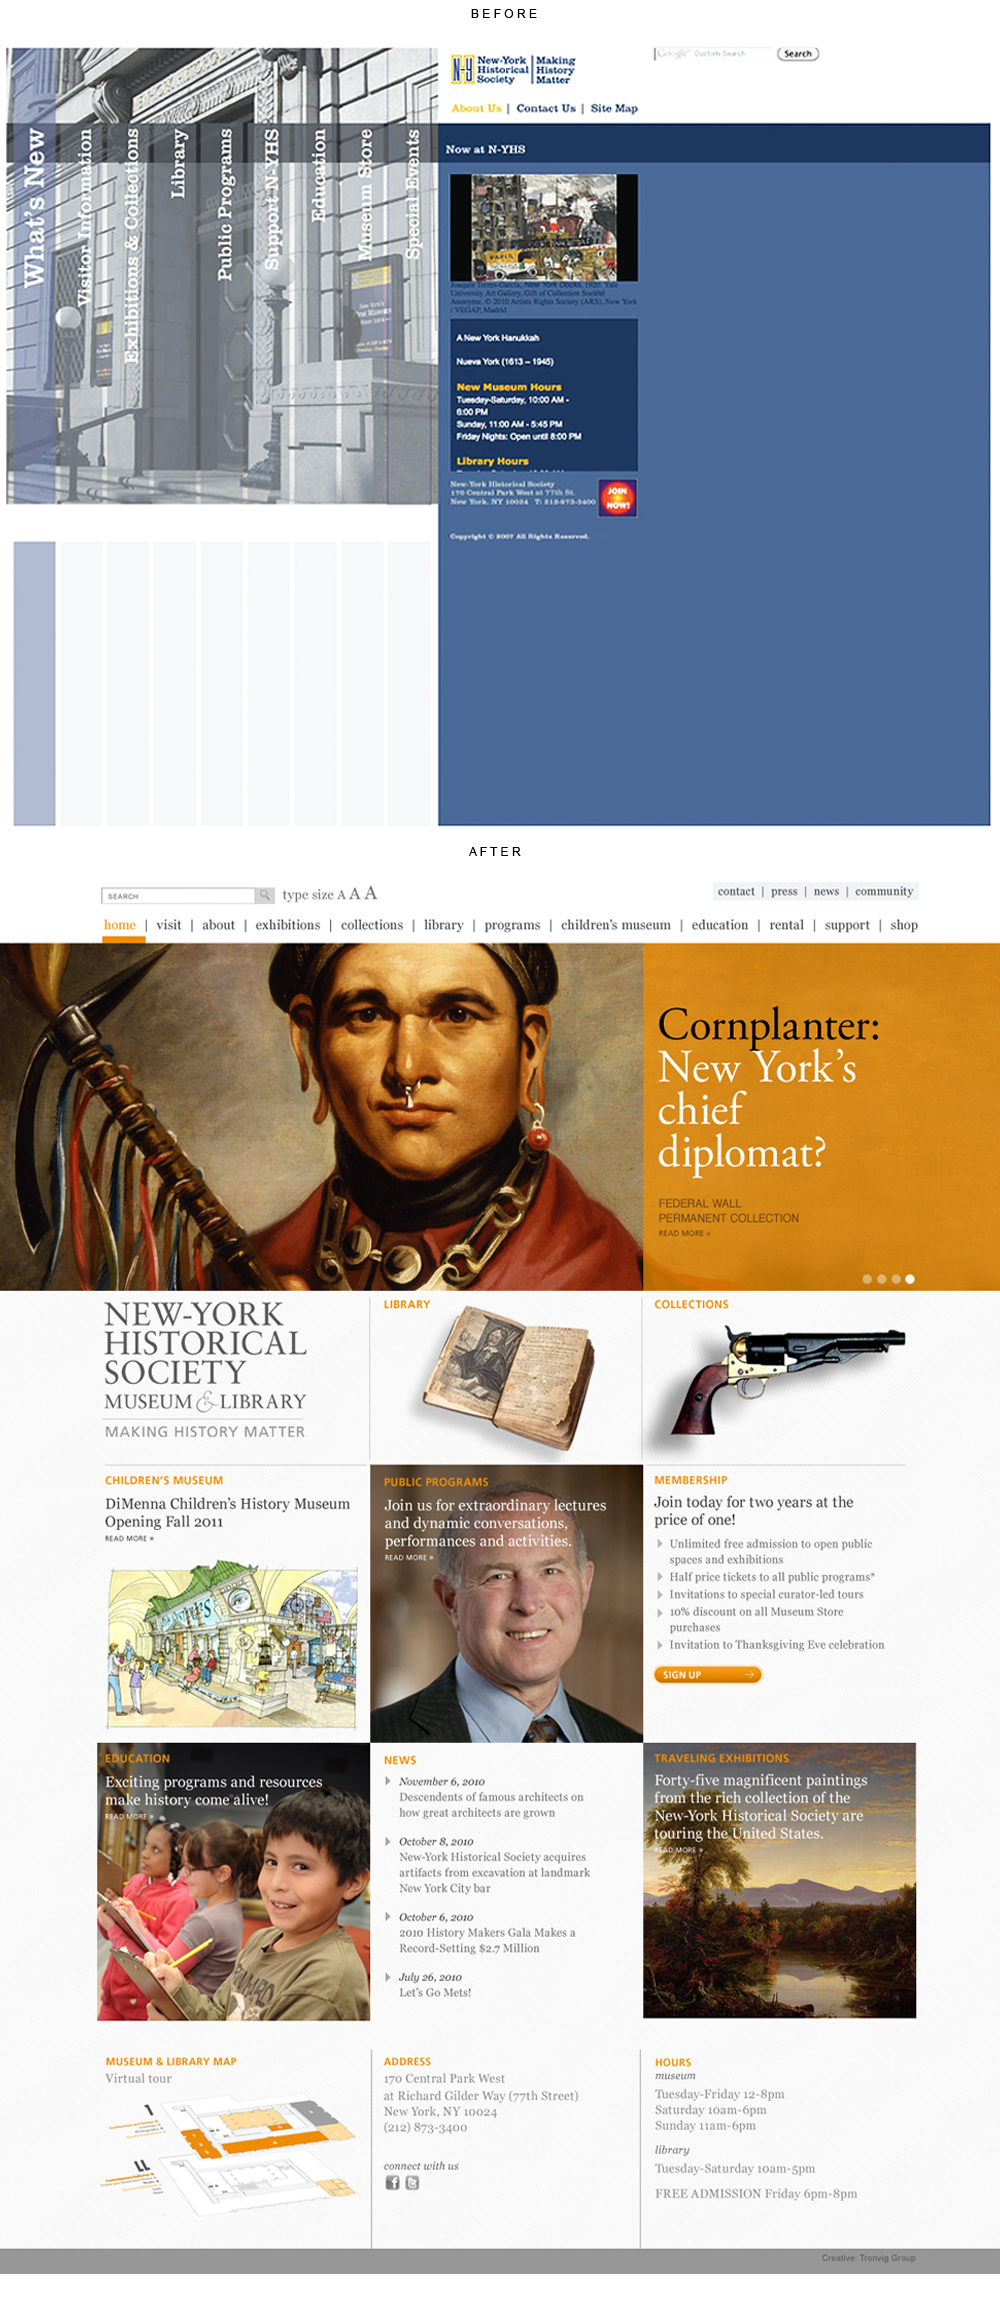 New-York Historical Society Museum website design